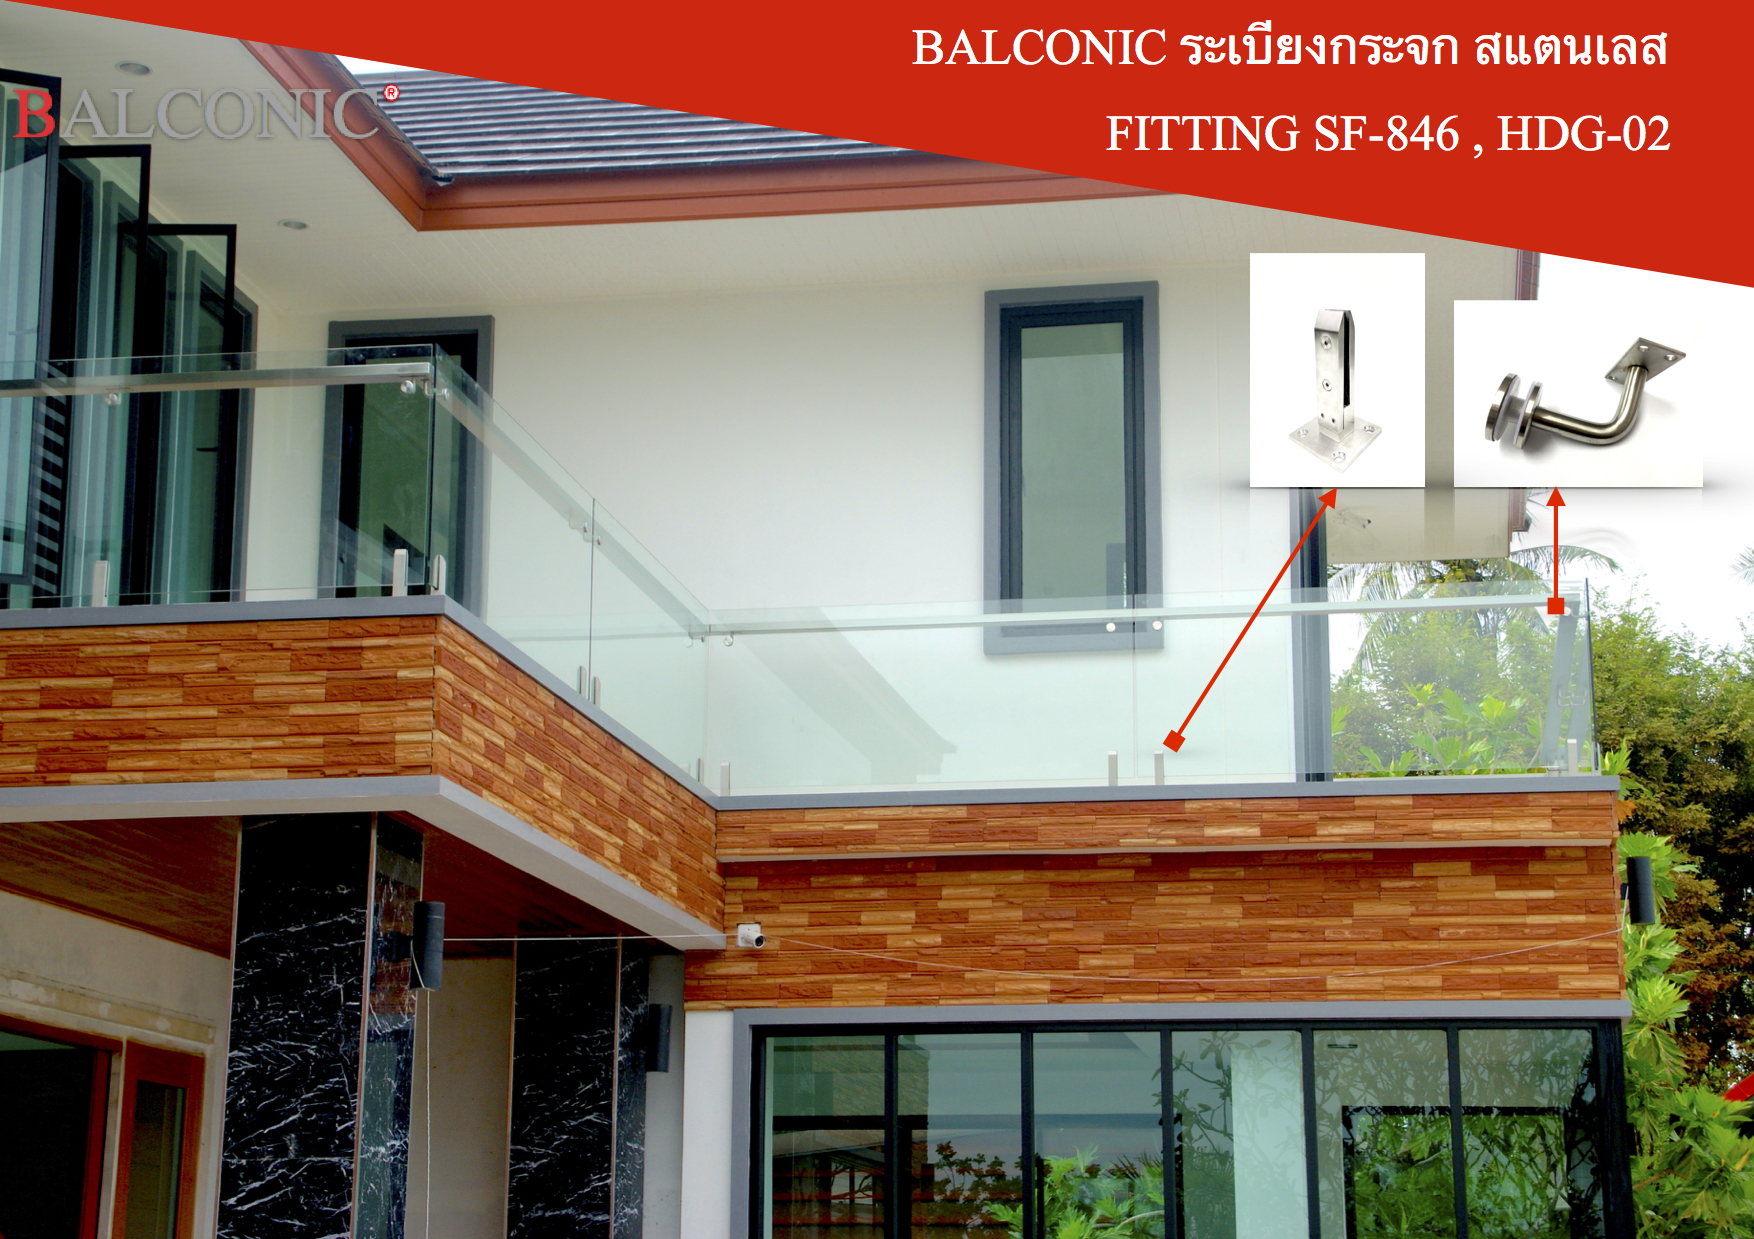 ADS BALCONIC 3